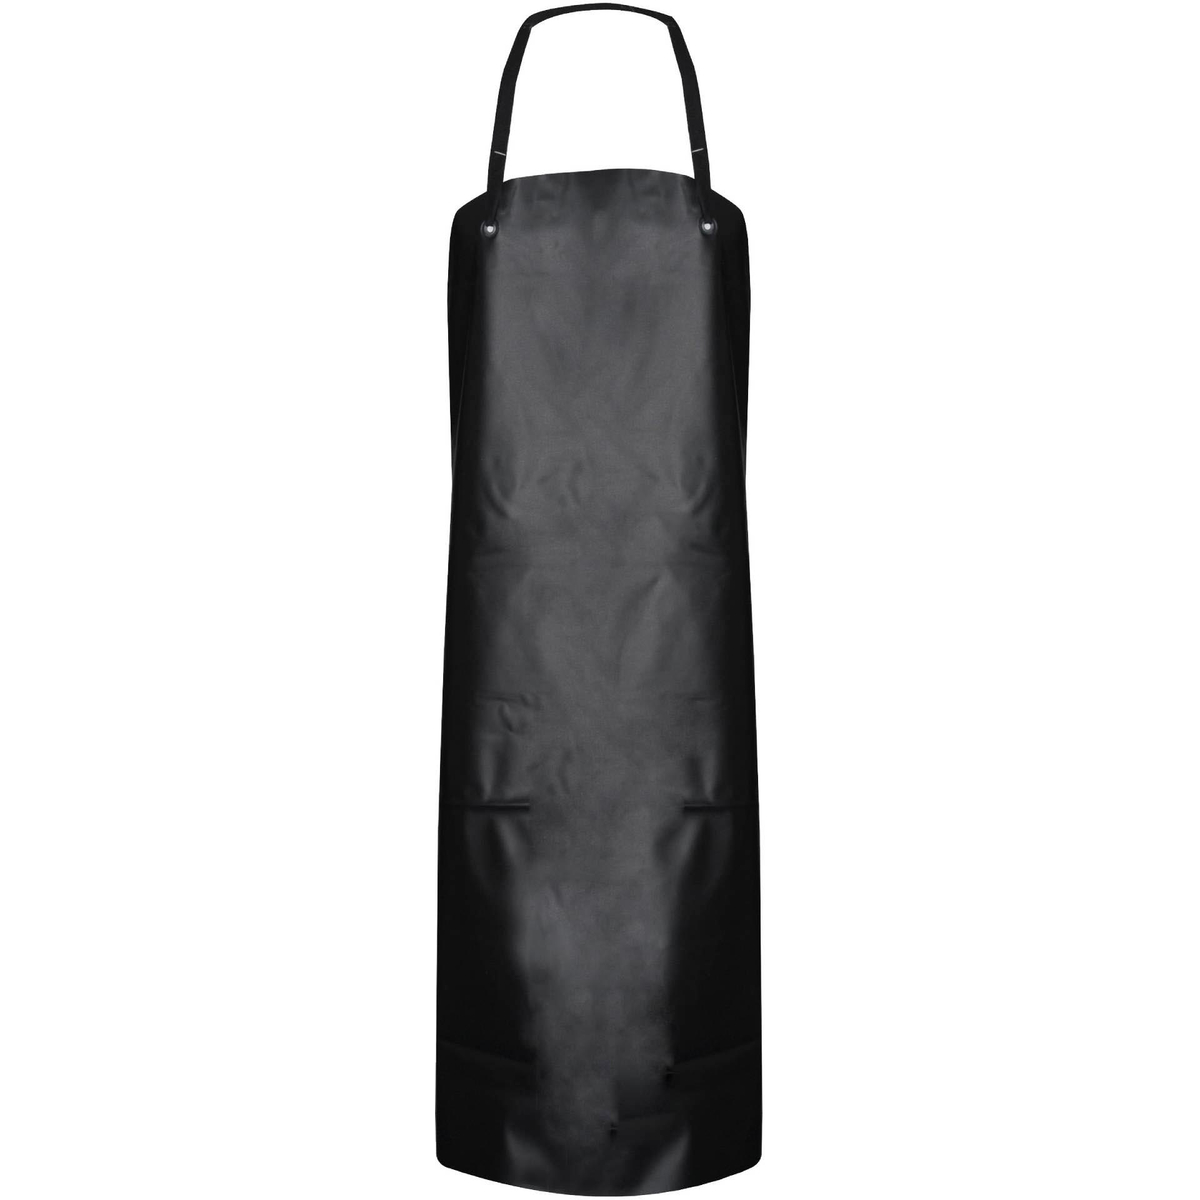 gunova s ureschutzsch rzen asatex s3s farbe schwarz 6 00. Black Bedroom Furniture Sets. Home Design Ideas